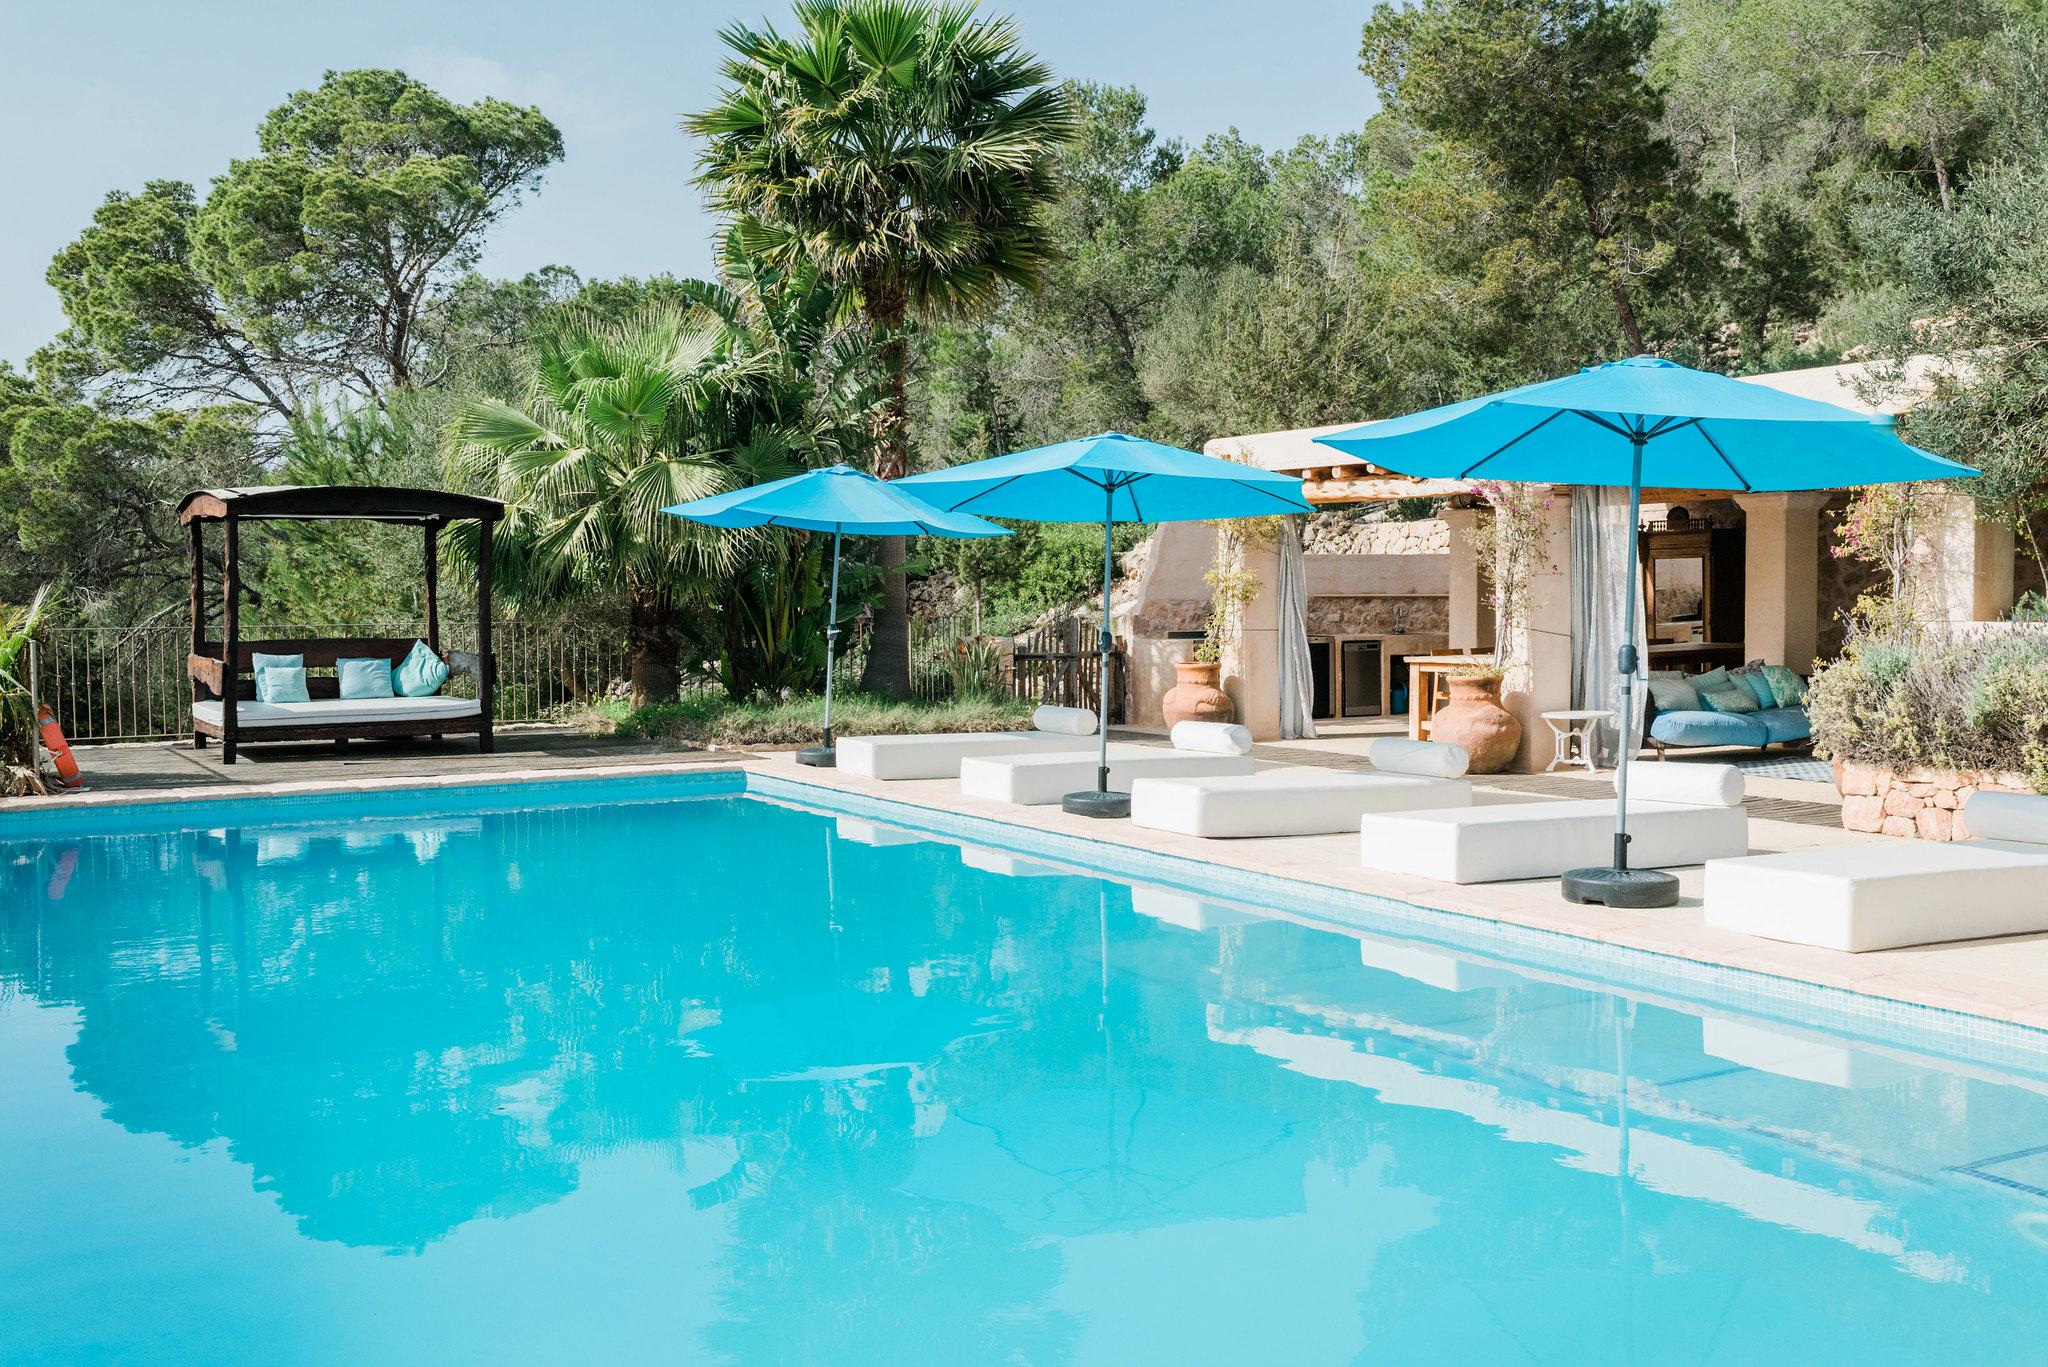 https://www.white-ibiza.com/wp-content/uploads/2020/06/white-ibiza-villas-los-corrales-exterior-pool2.jpg